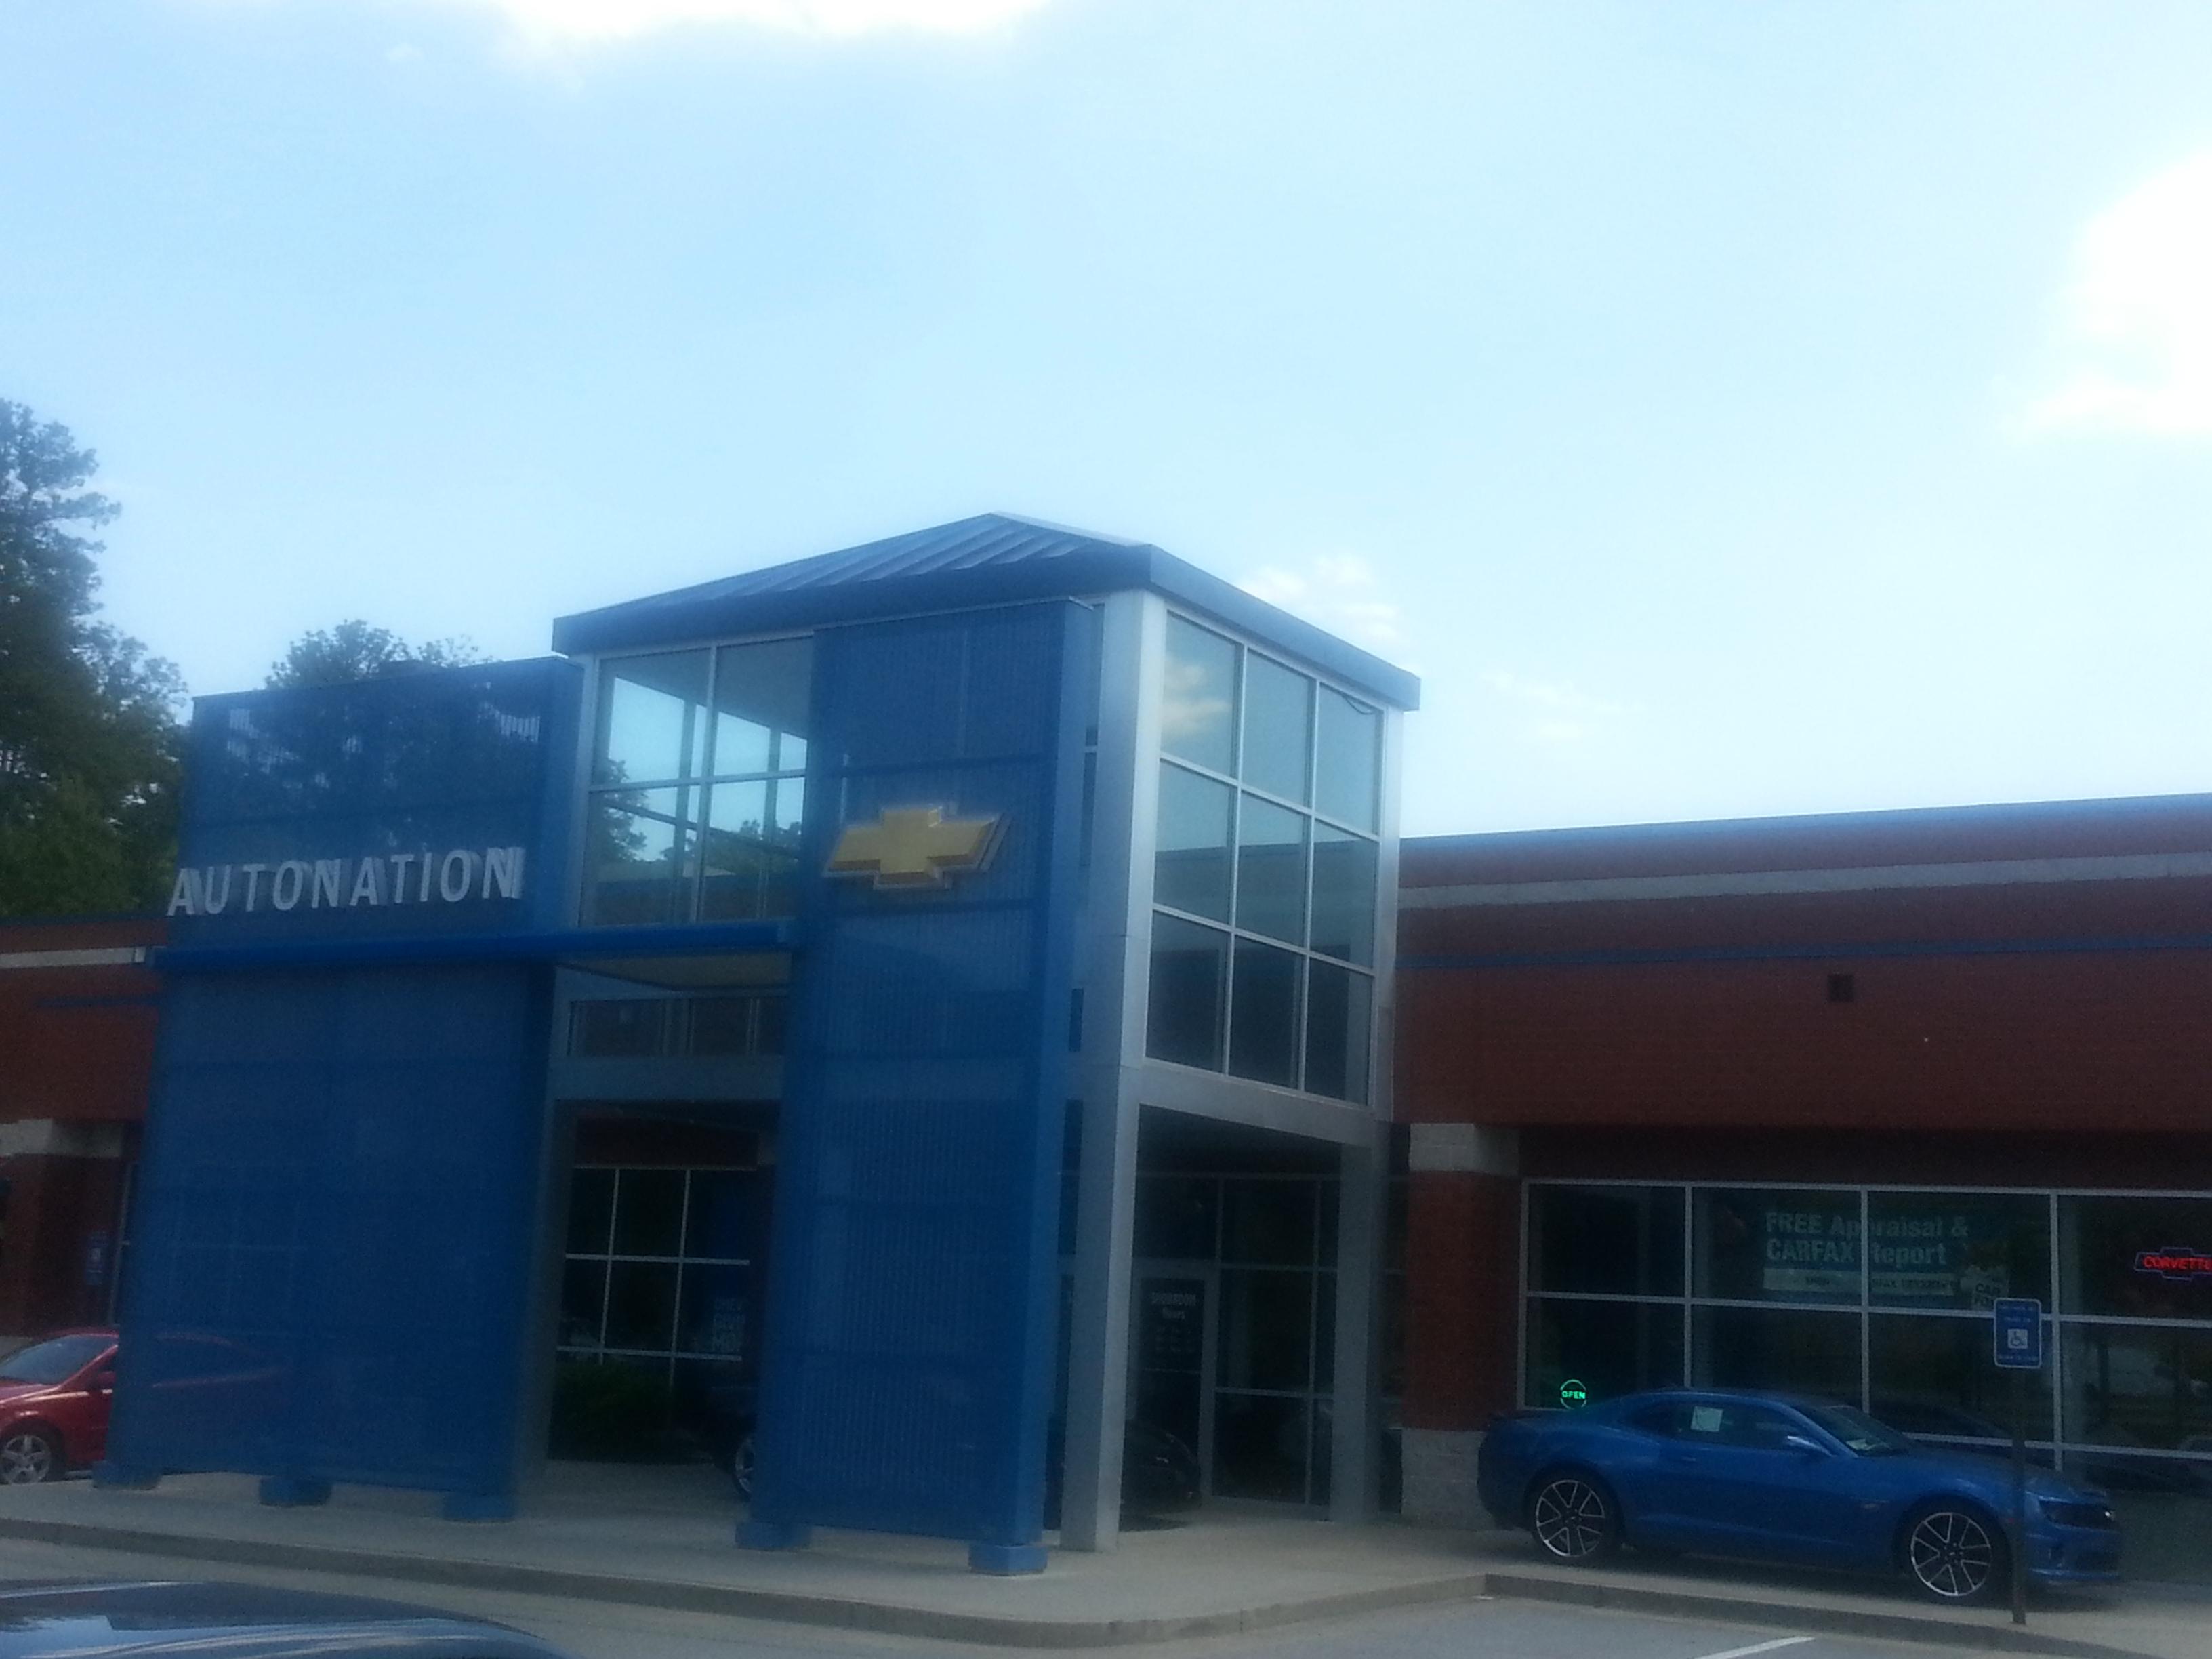 Chevrolet Autonation Alpharetta   Upcomingcarshq.com